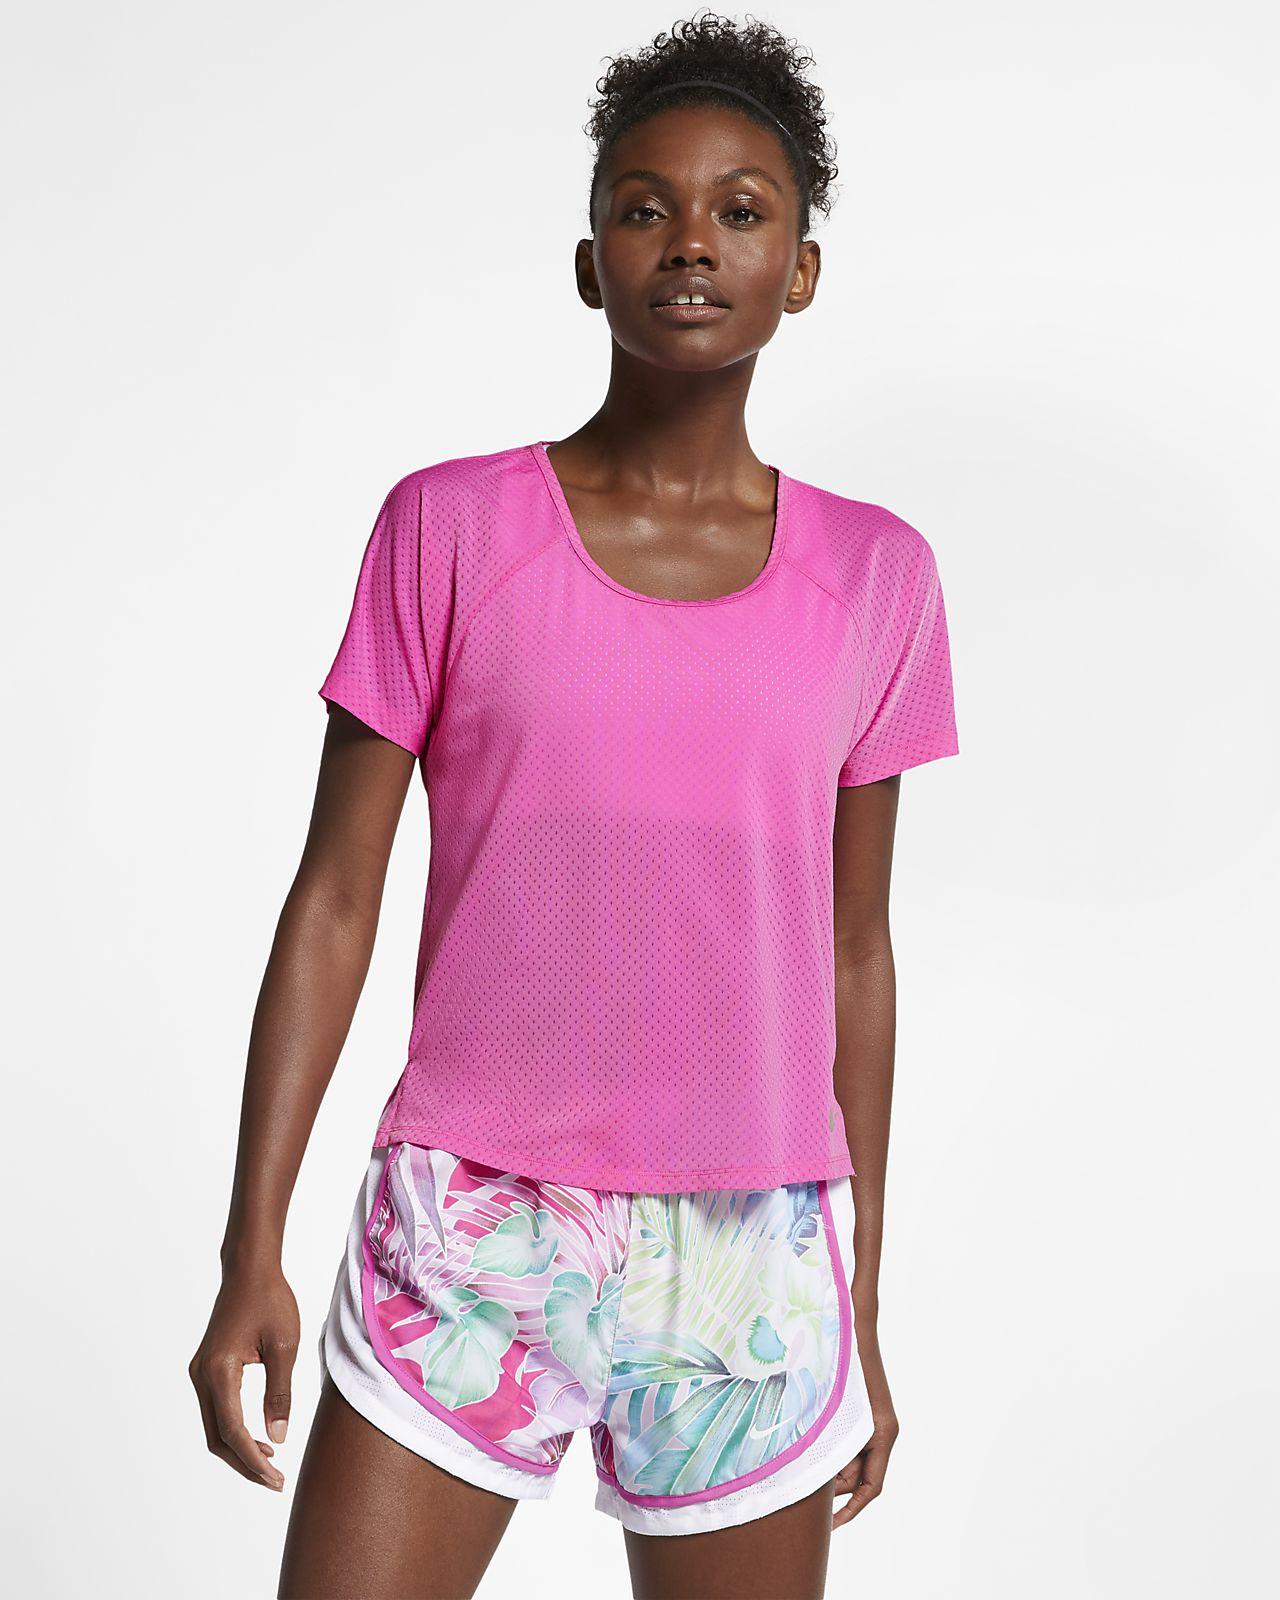 Breathe Miler Women's Running Top. Nike MA